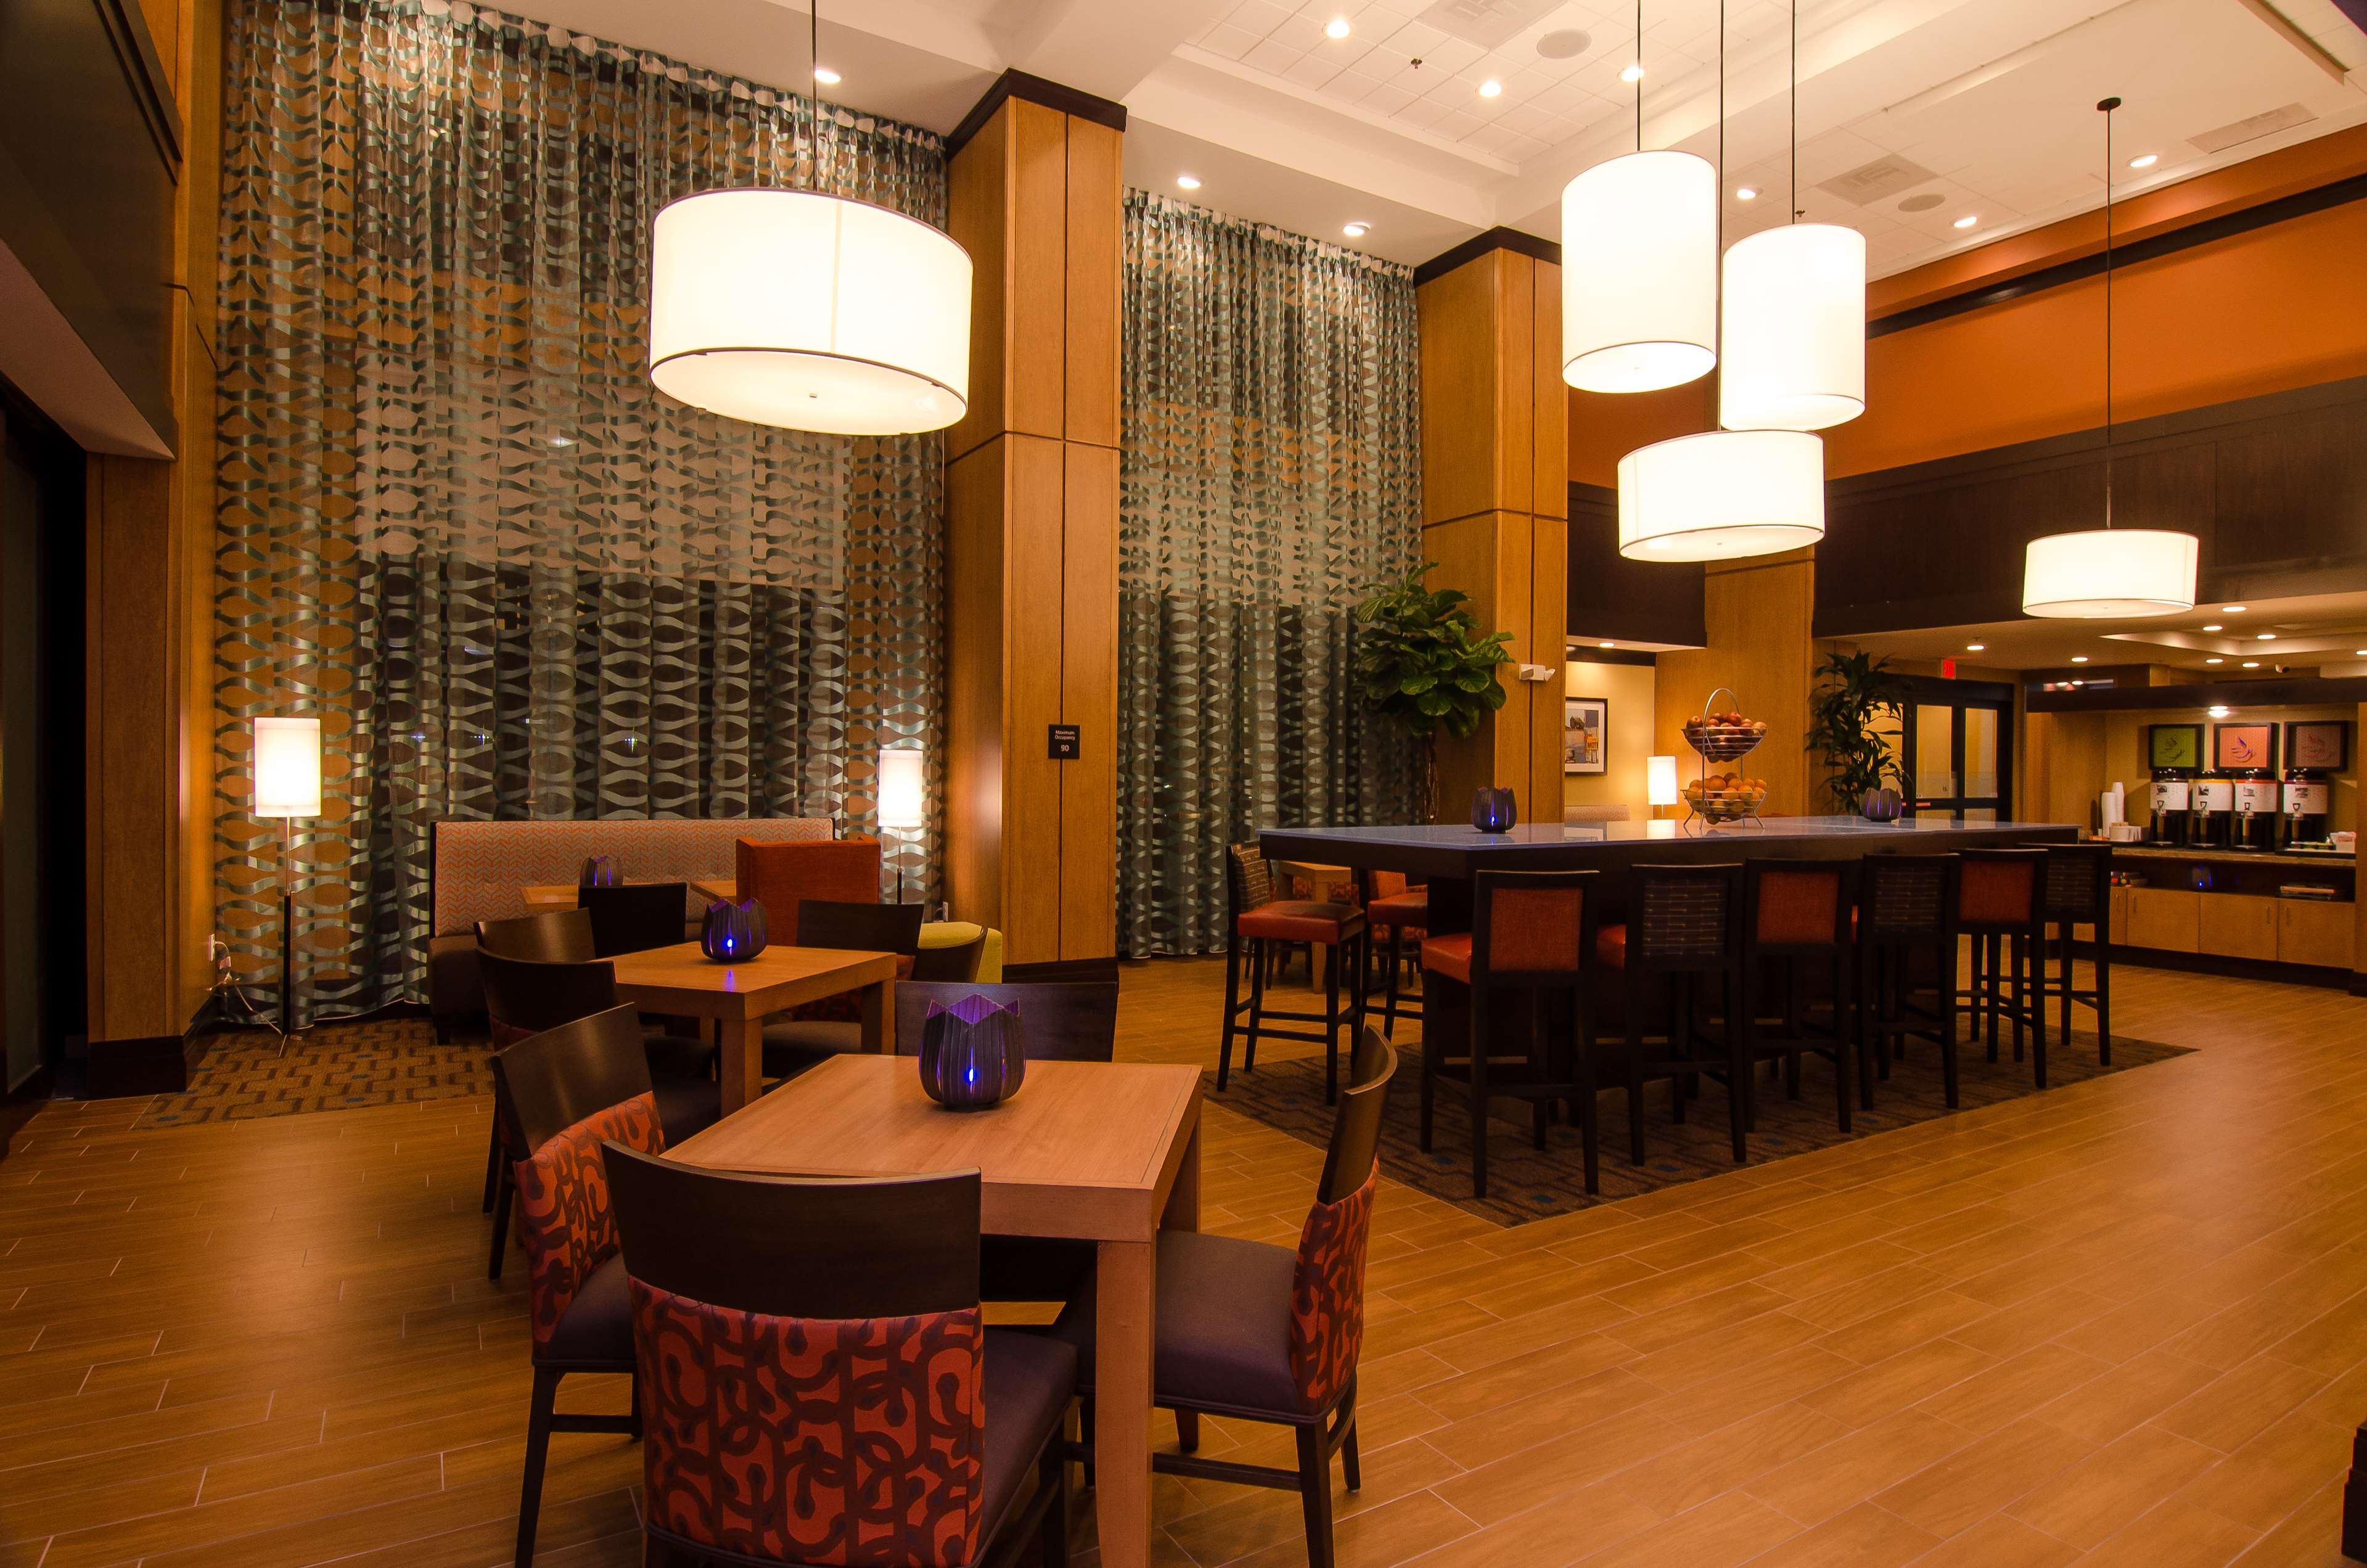 Hampton Inn & Suites Houston North IAH image 9